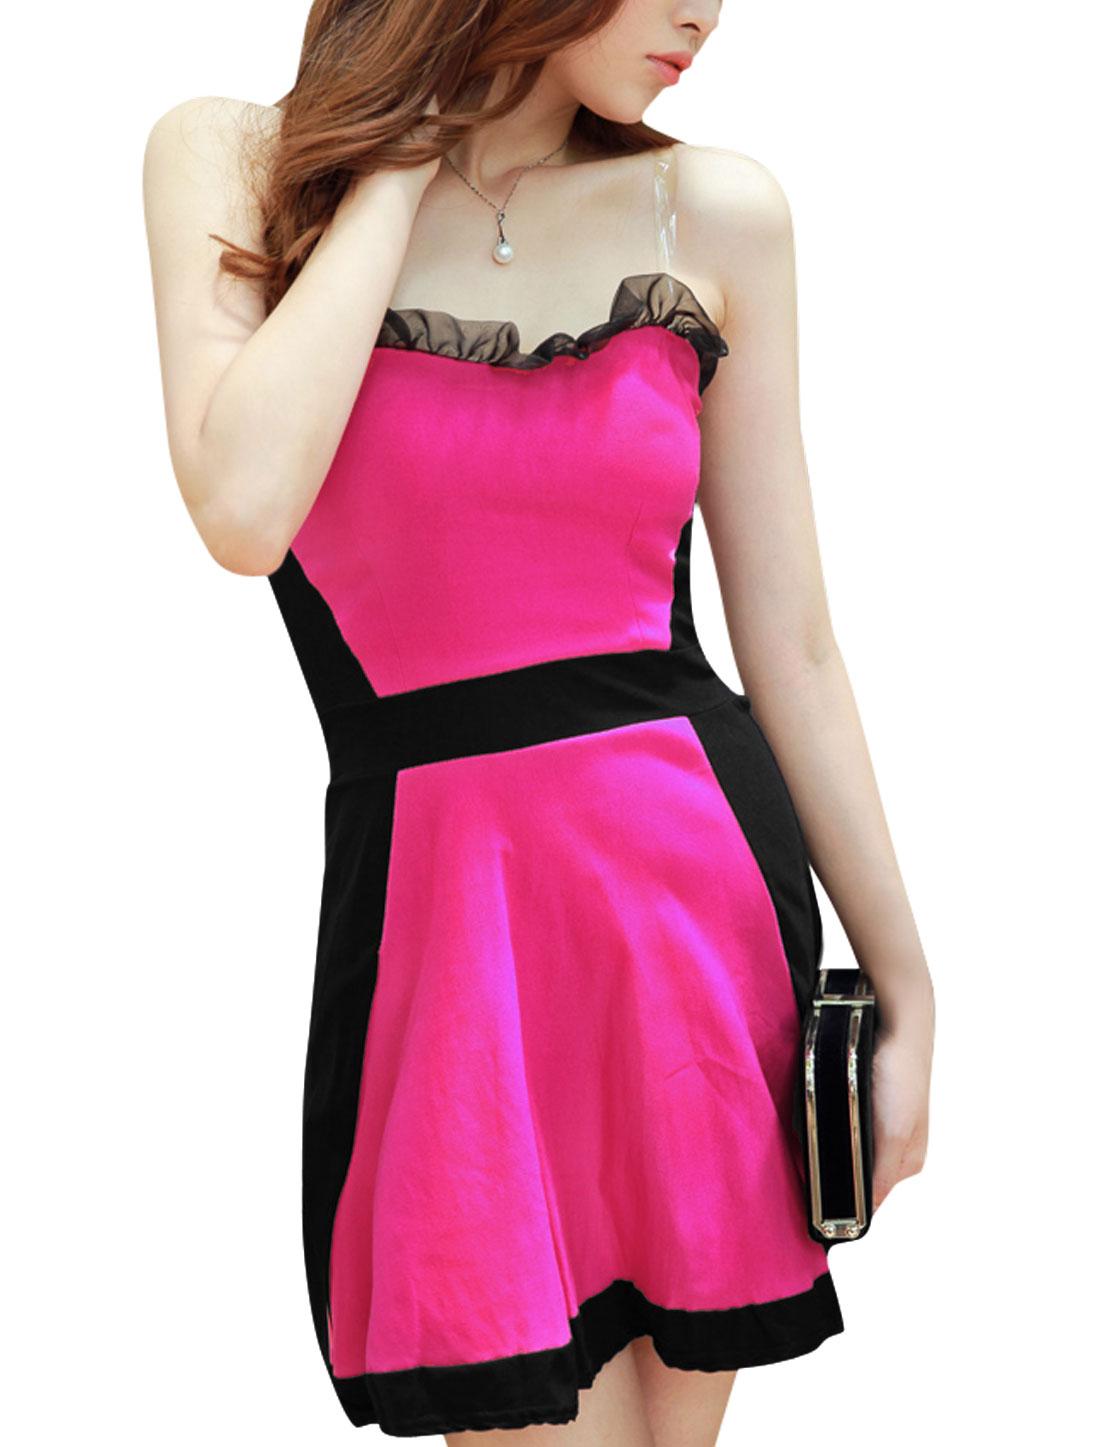 Ladies Ruffled Detail Panel Design Fuchsia Sheath Dress S